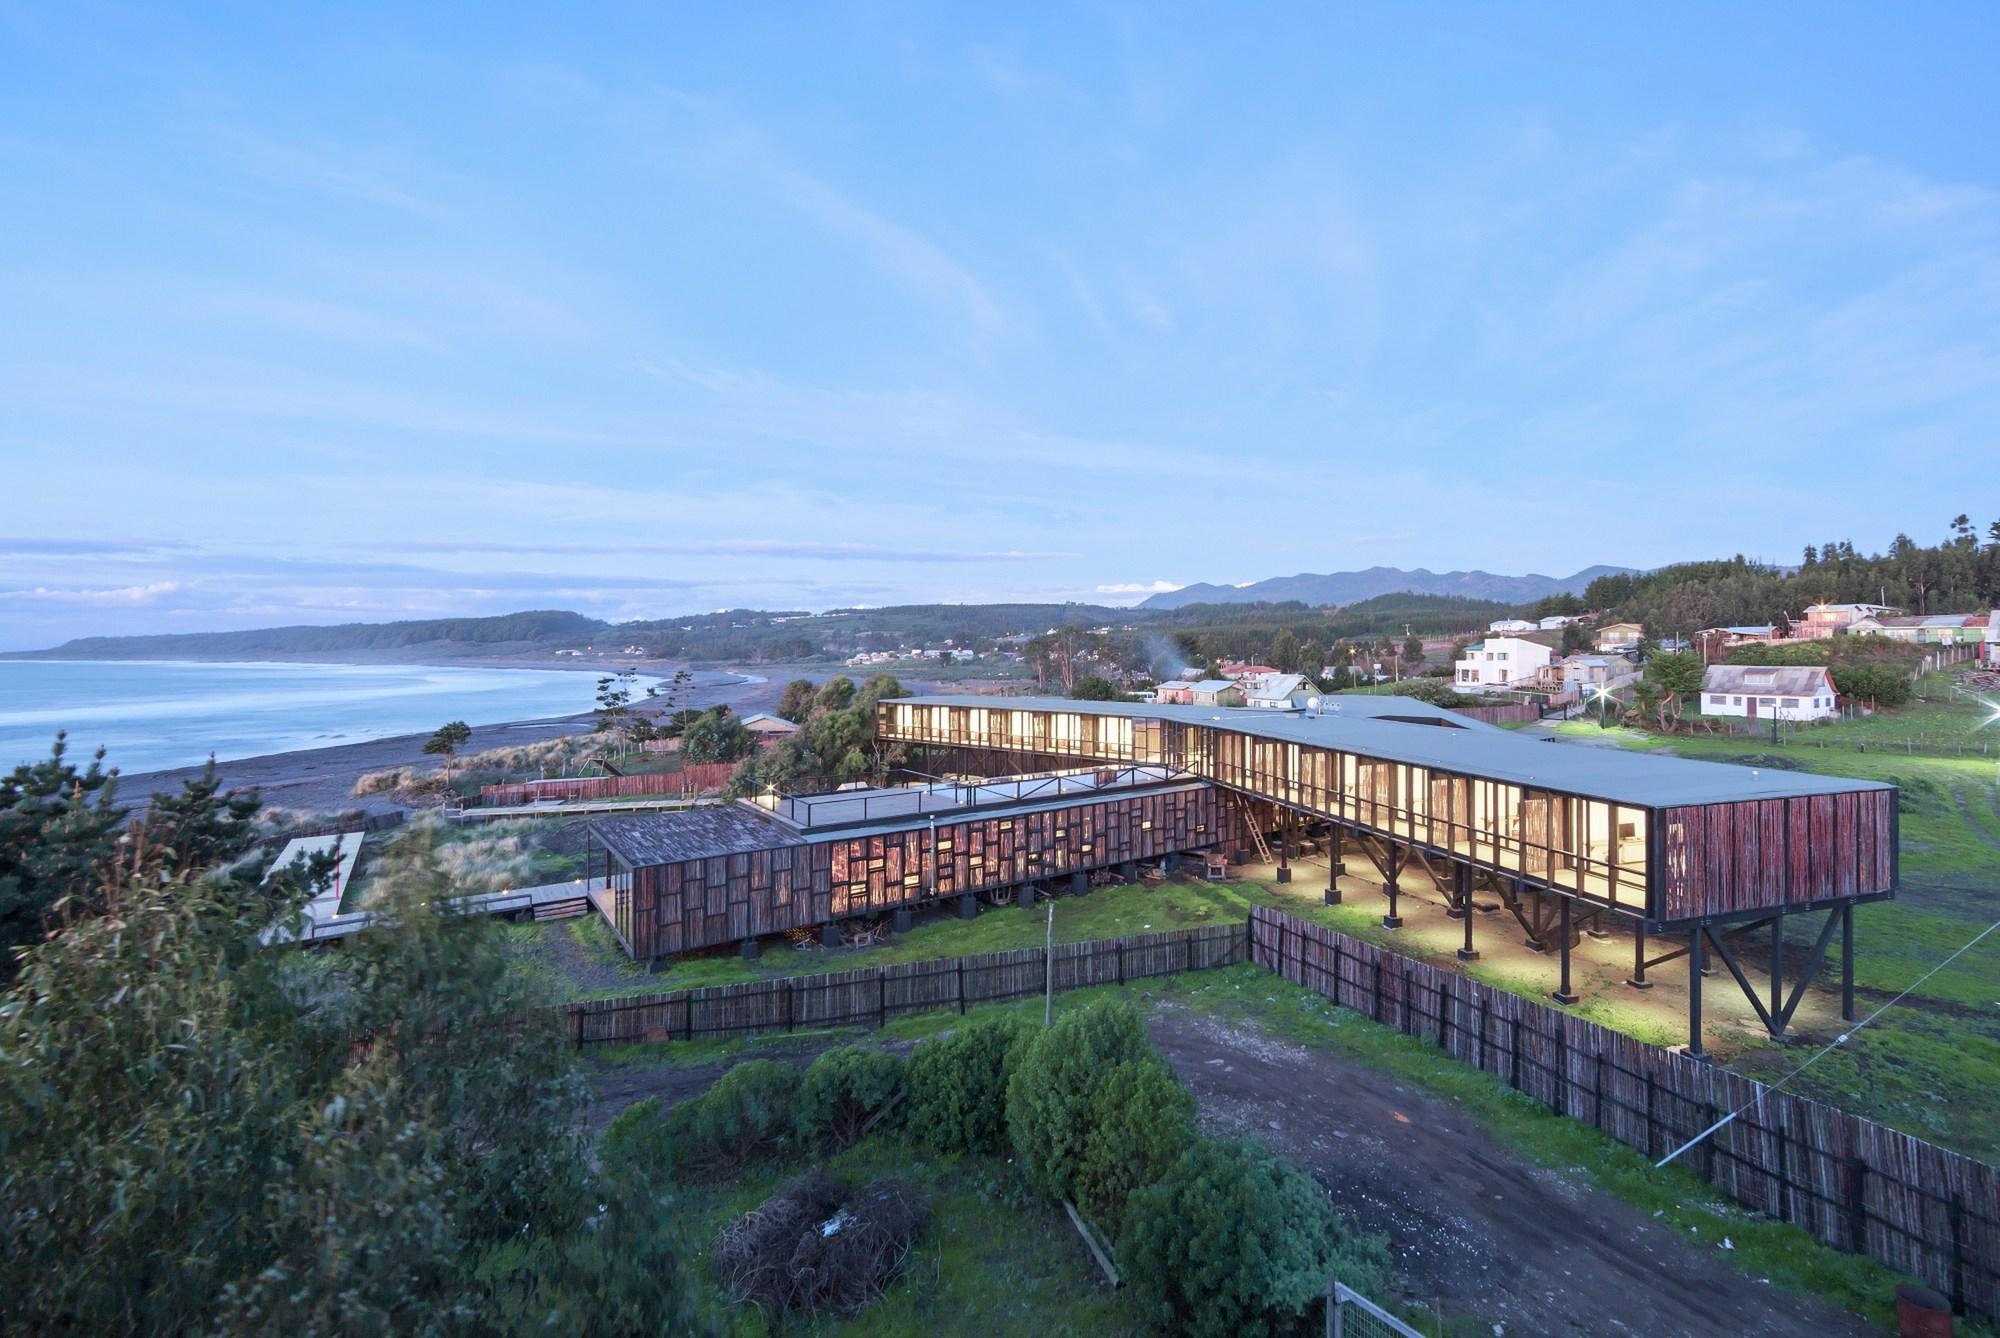 Hotel punta sirena wmr arquitectos plataforma arquitectura for Arquitectura de hoteles